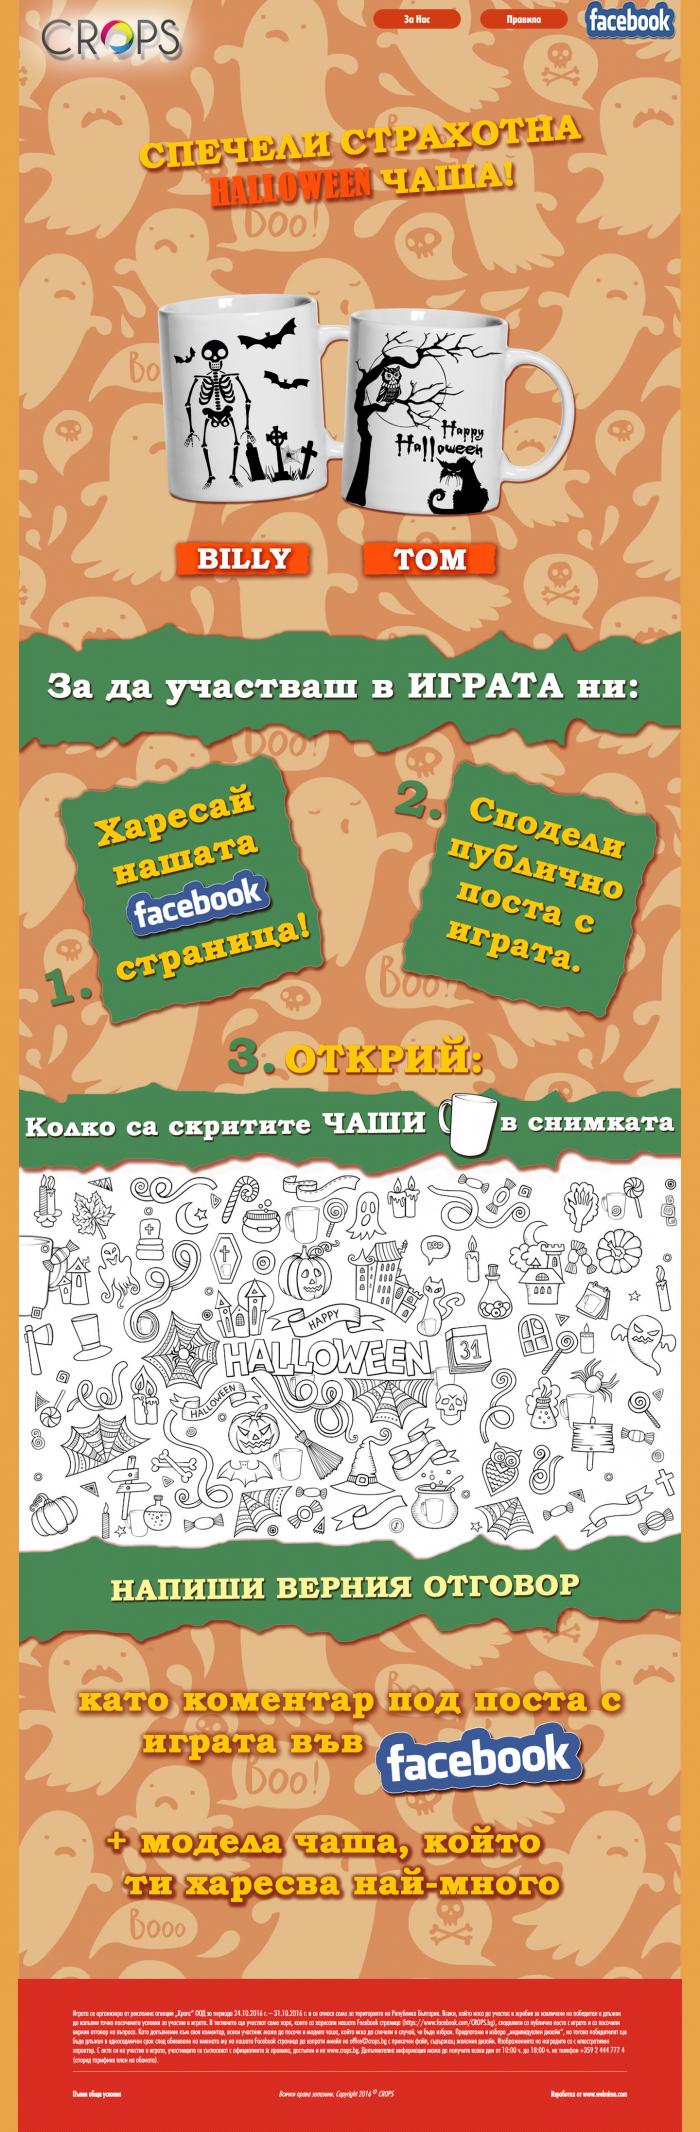 Facebook игра за Хелоуин, https://webnime.com